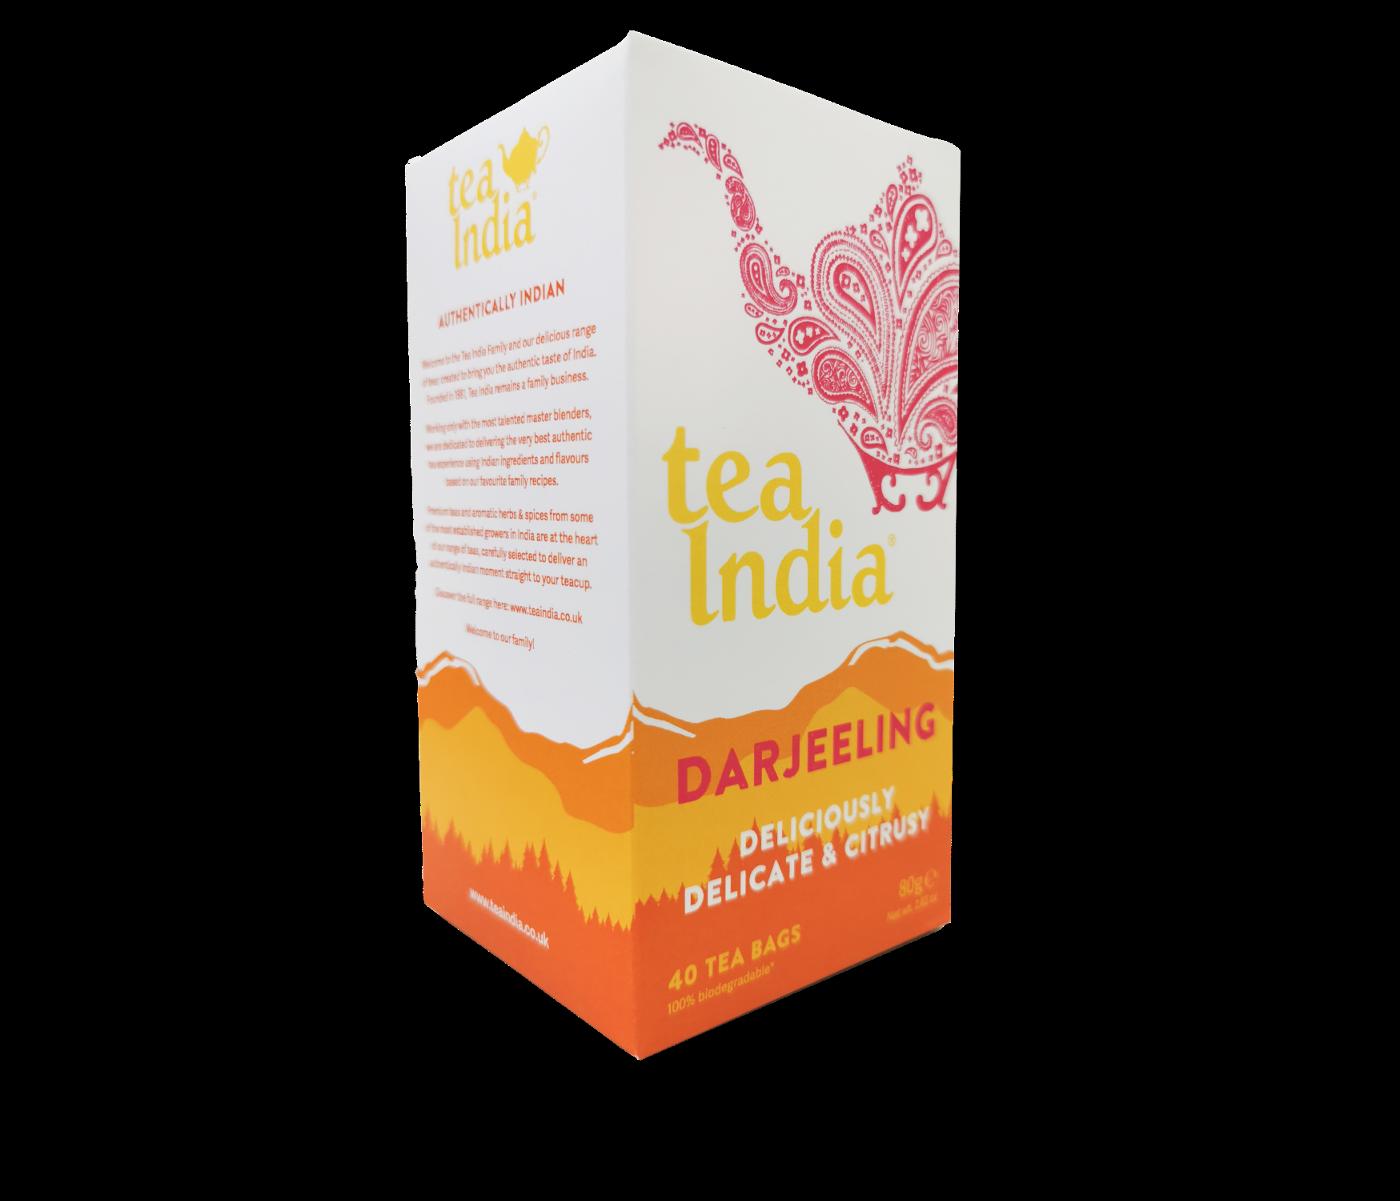 Tea India Darjeeling